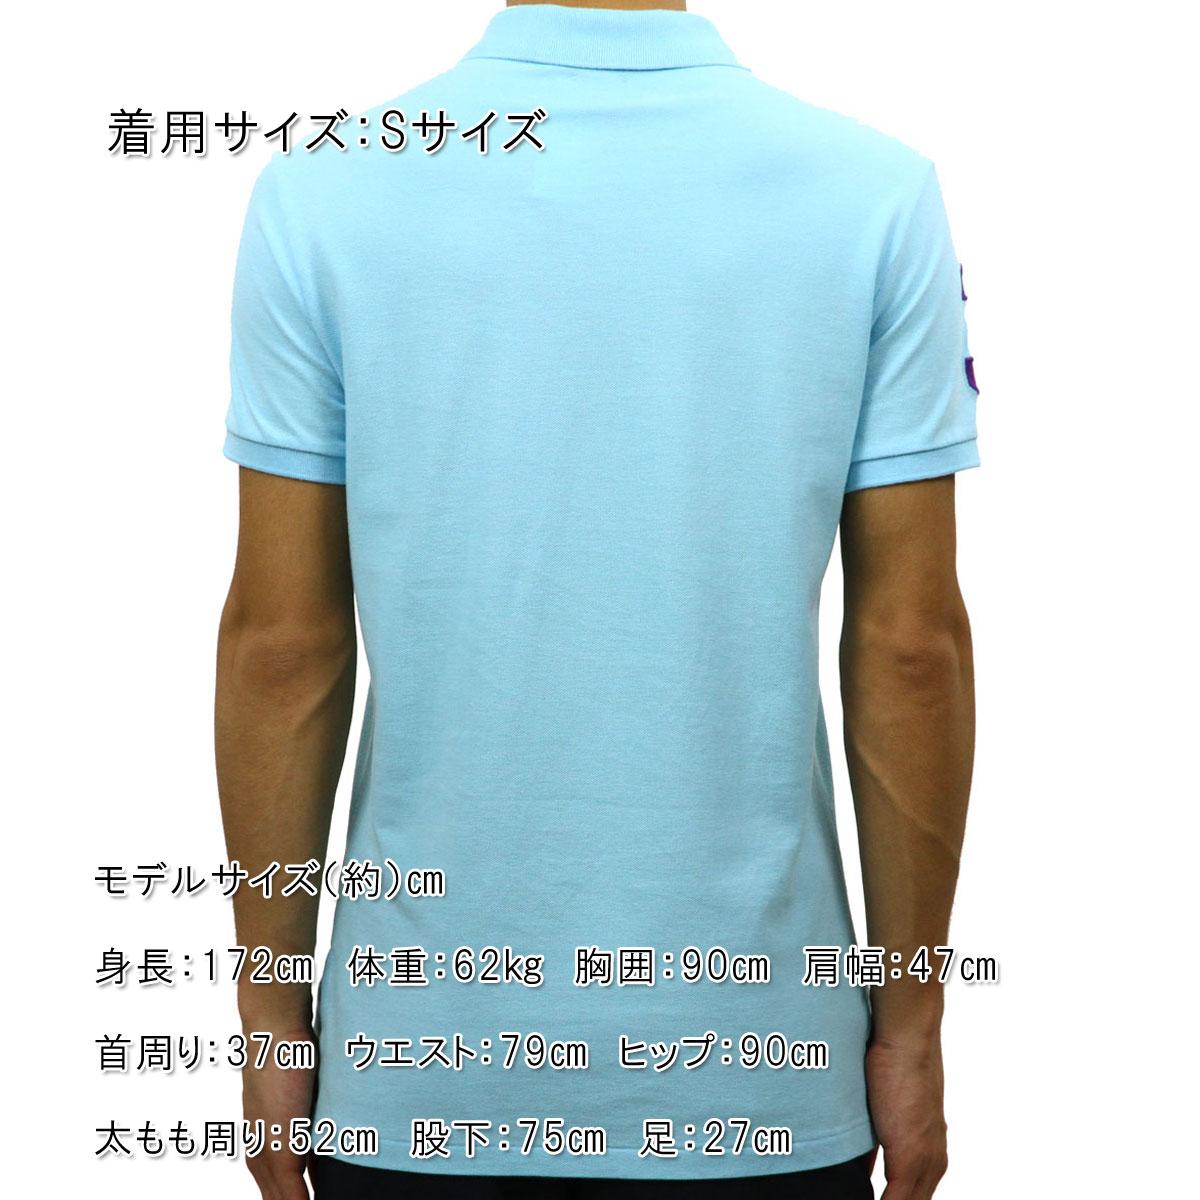 225a61571eb88 ポロラルフローレン POLO RALPH LAUREN 正規品 メンズ 半袖ポロシャツ CUSTOM-FIT BIG PONY POLO  ralph_mens_7